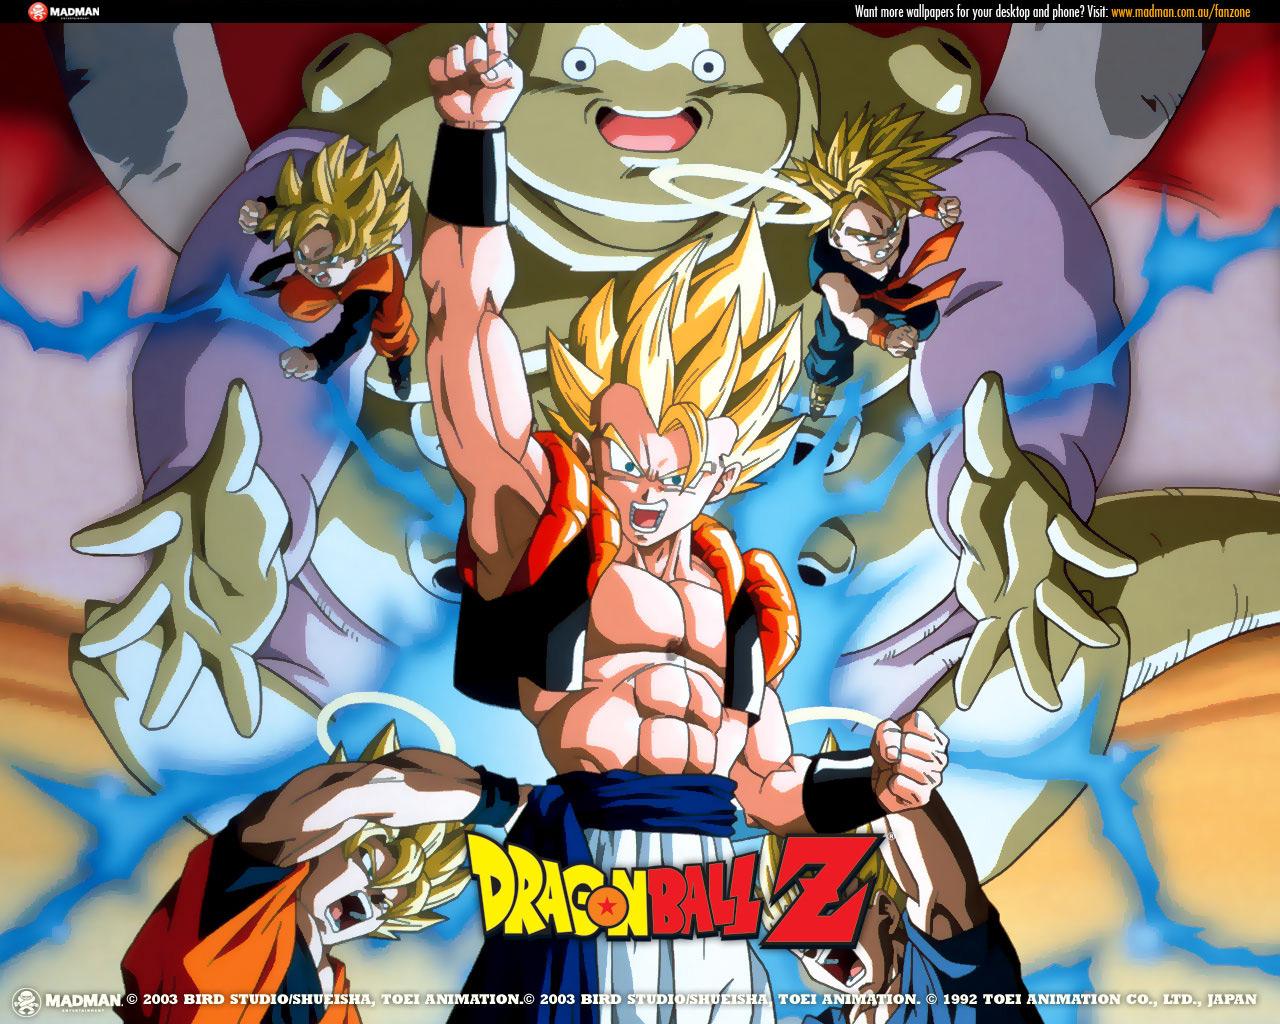 http://2.bp.blogspot.com/-oY1cAdcg-NE/TmympenKqbI/AAAAAAAADqY/EaXVqUujwZg/s1600/3586-anime_dragon_ball_z_wallpaper.jpg